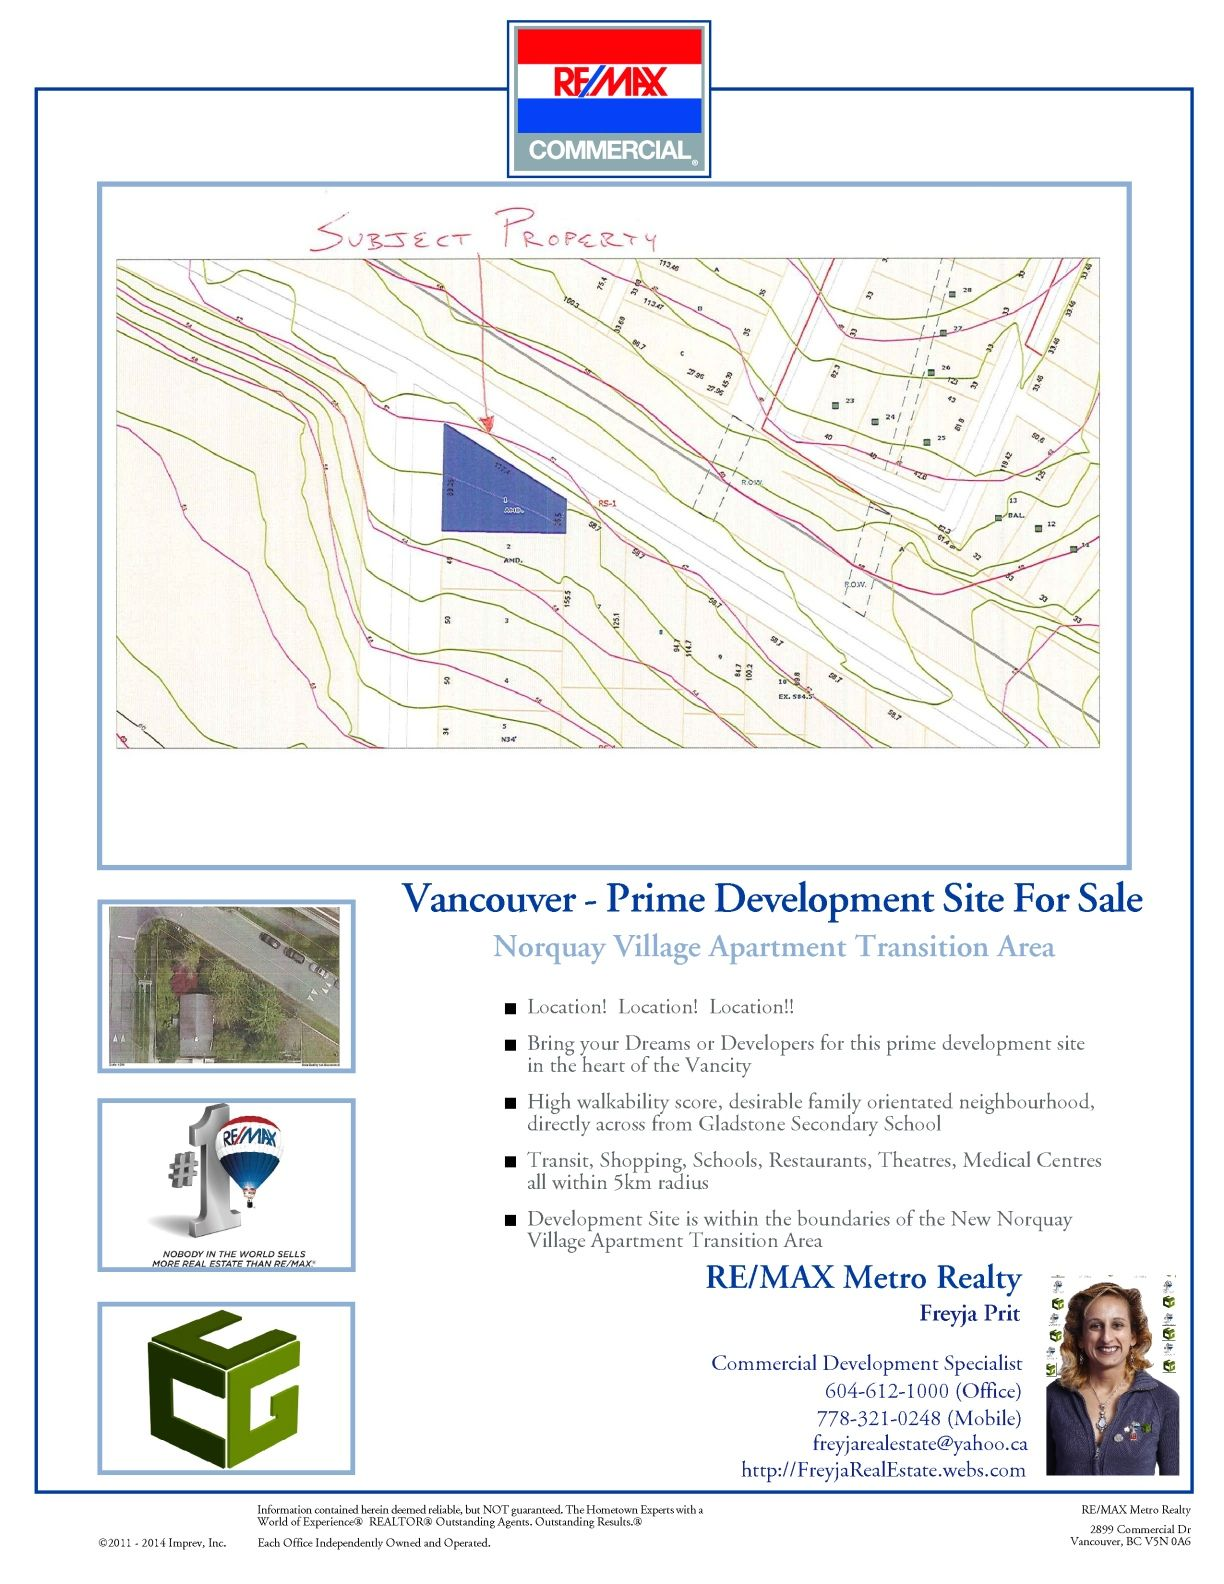 #ForSale #Prime #Development #Site in #Vancouver #NorquayVillage